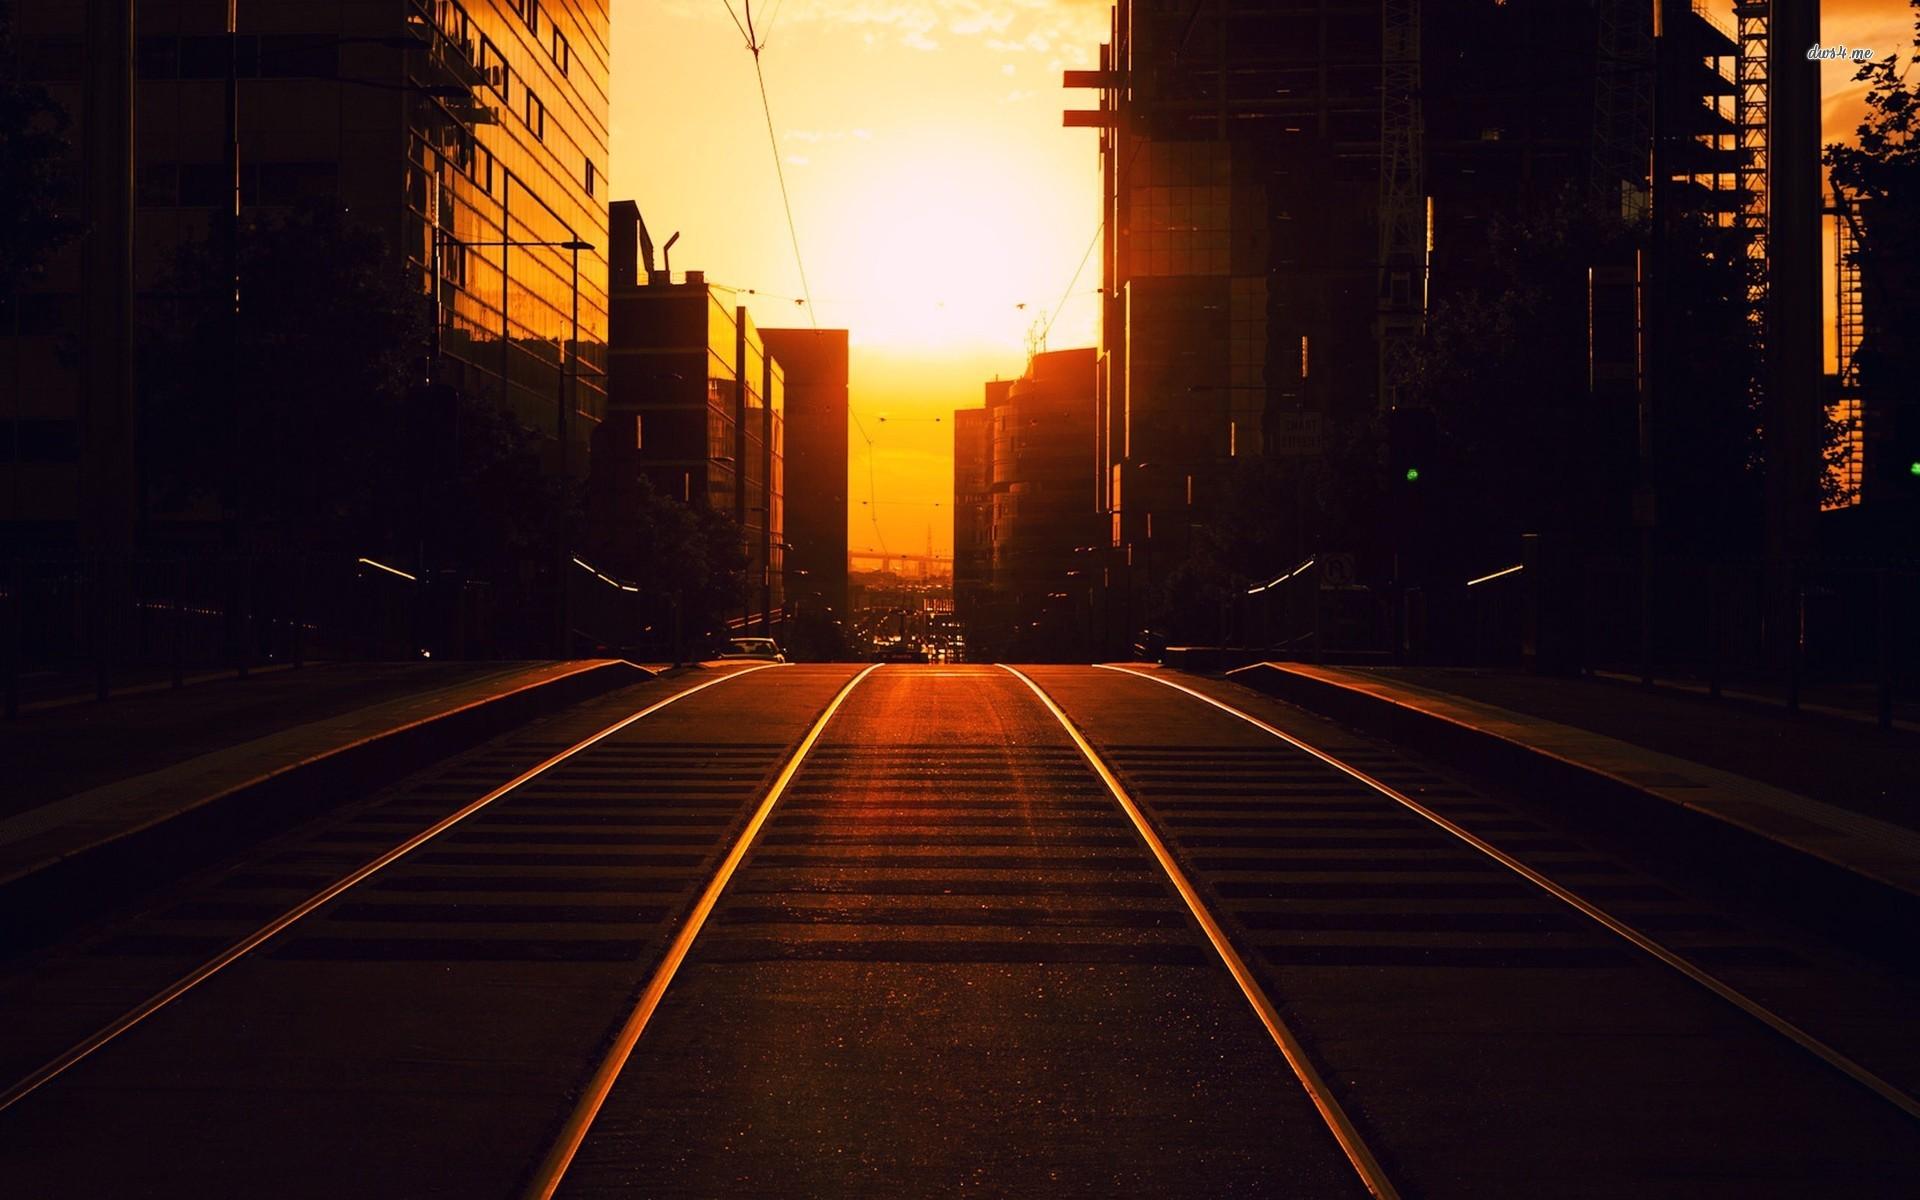 City Sunset Wallpaper High Definition Iphone Sunny Src